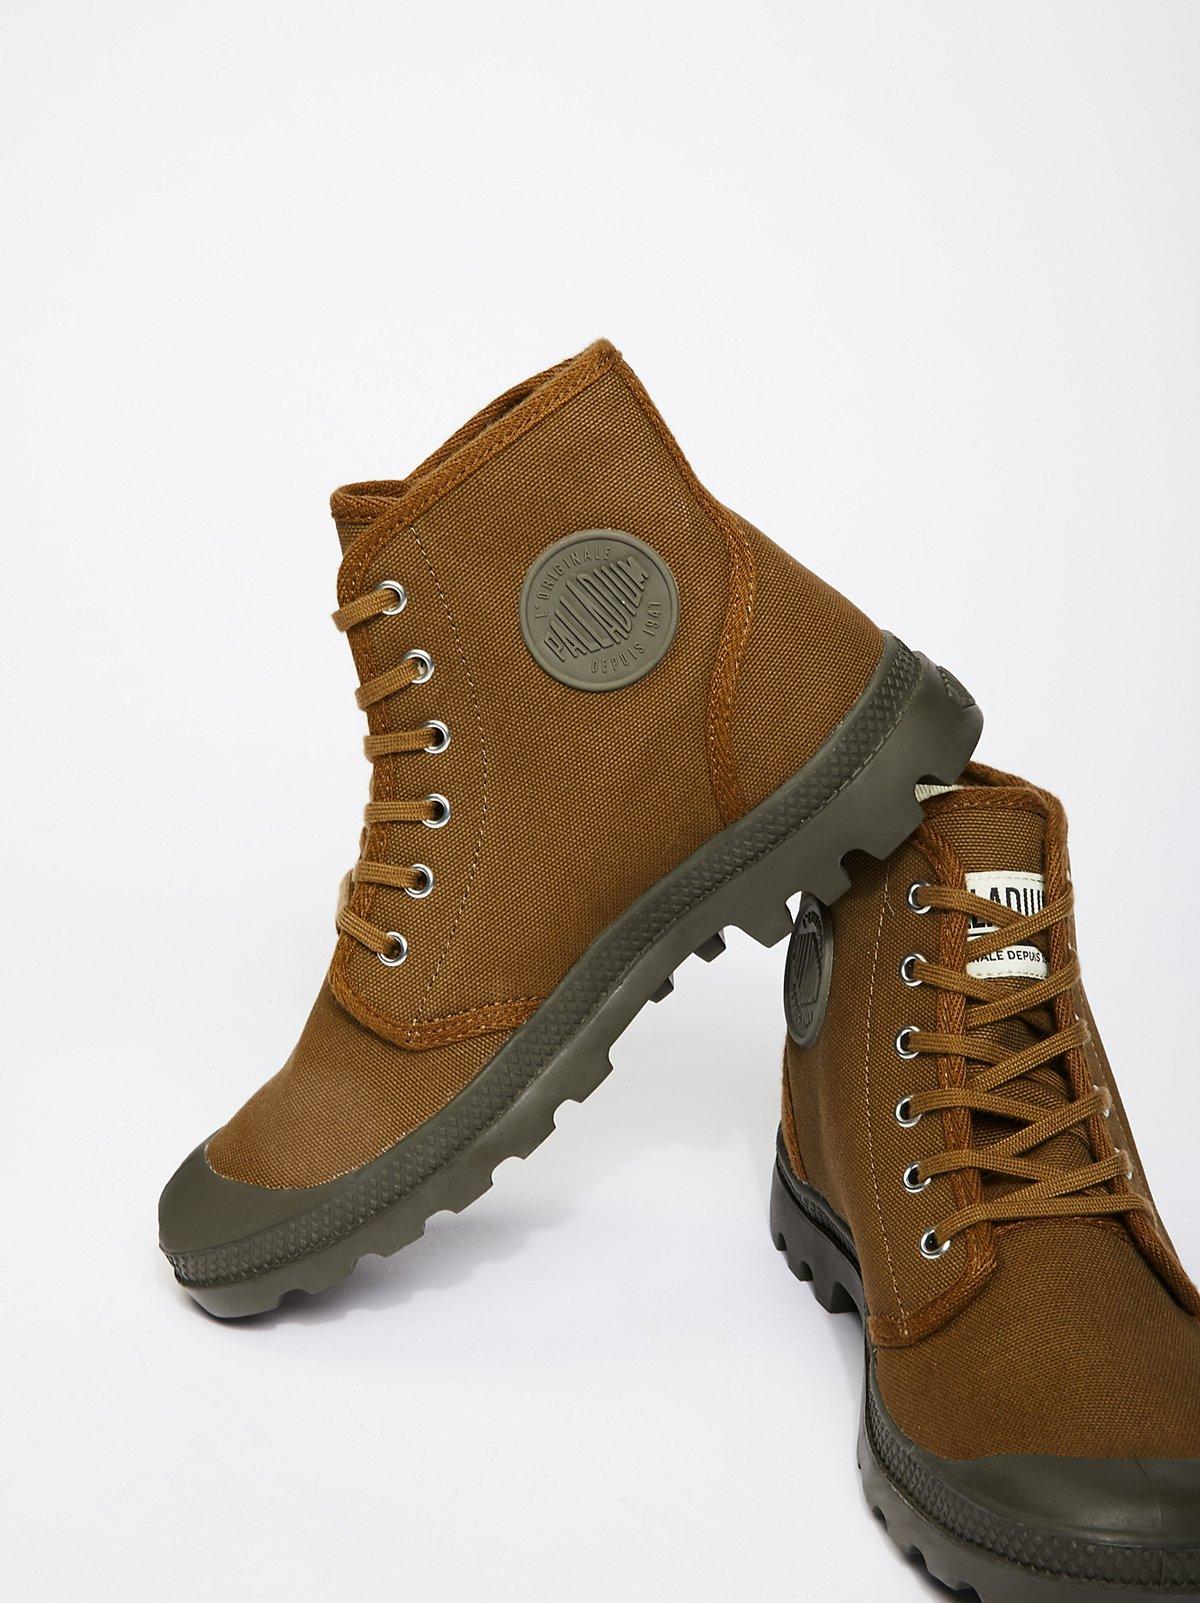 Pampa Hi Original靴子